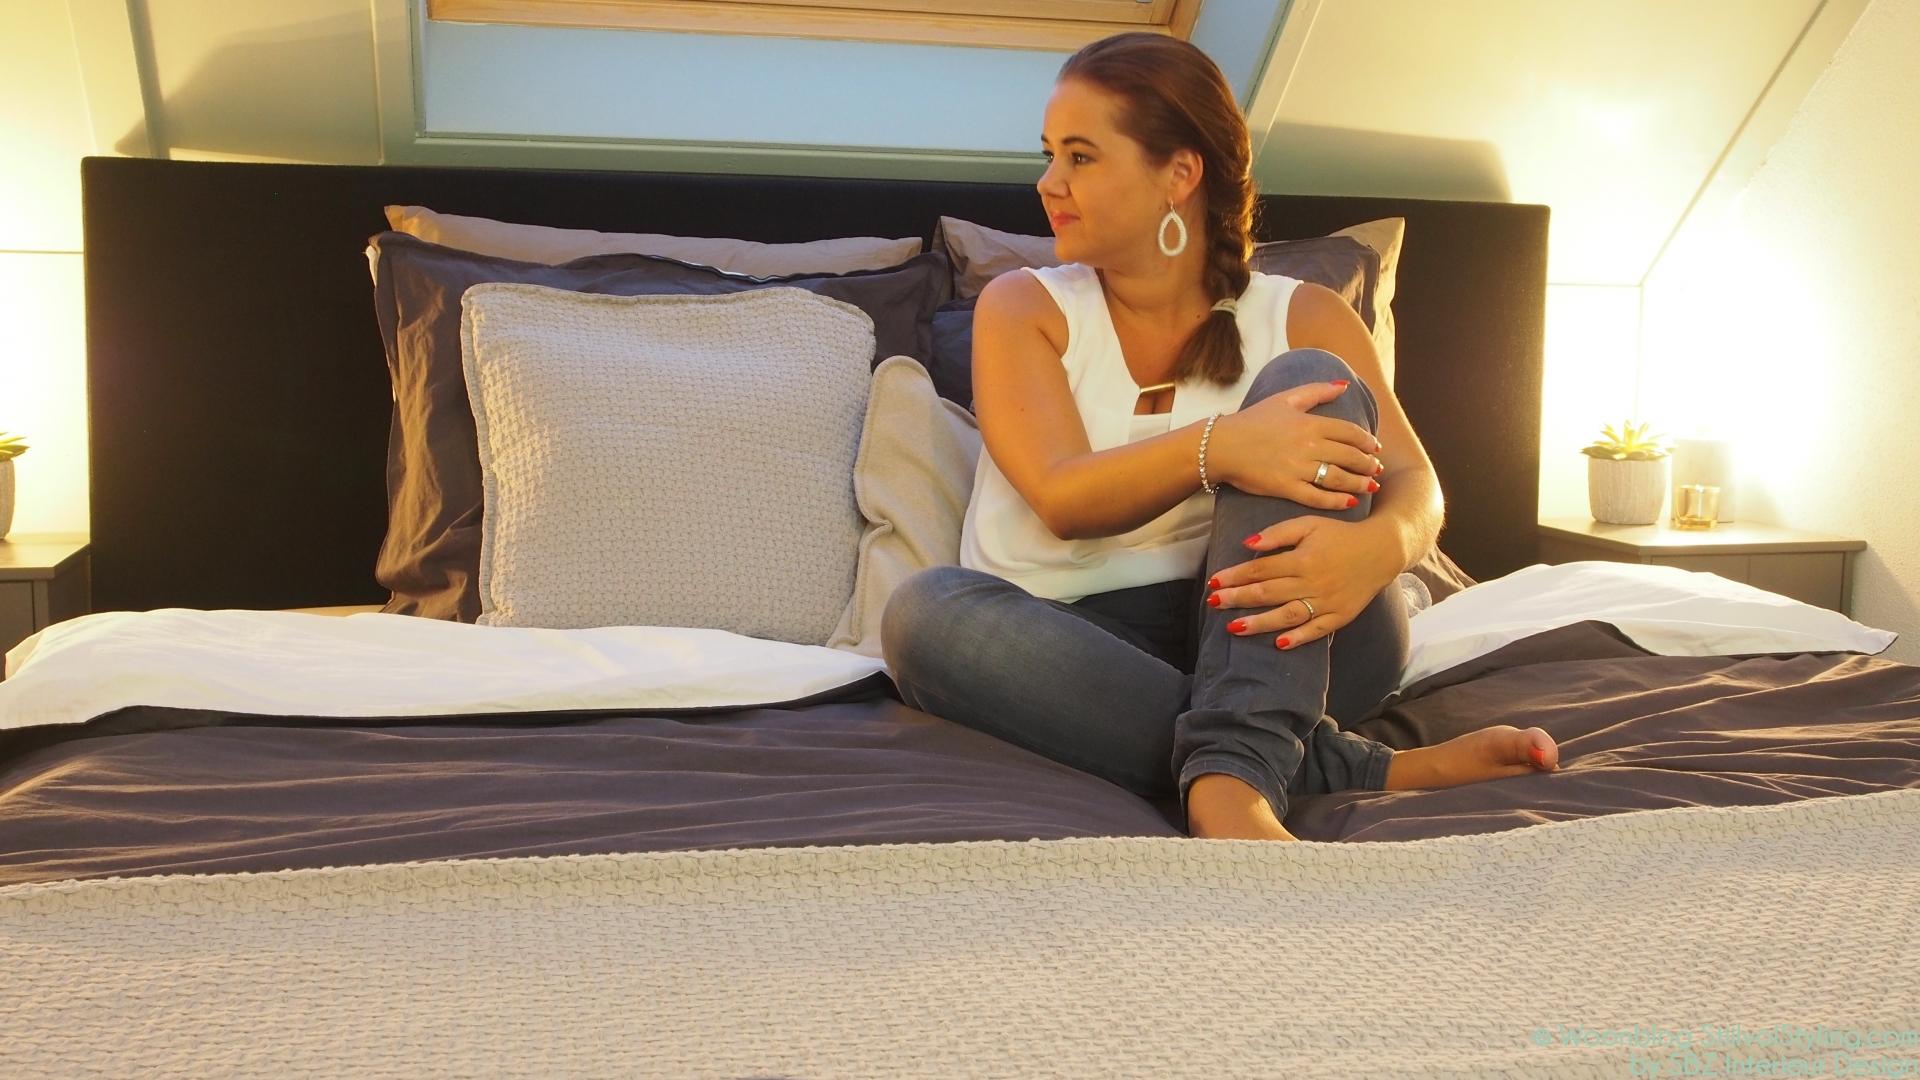 Luxe slaapkamer interieur ~ [spscents.com]